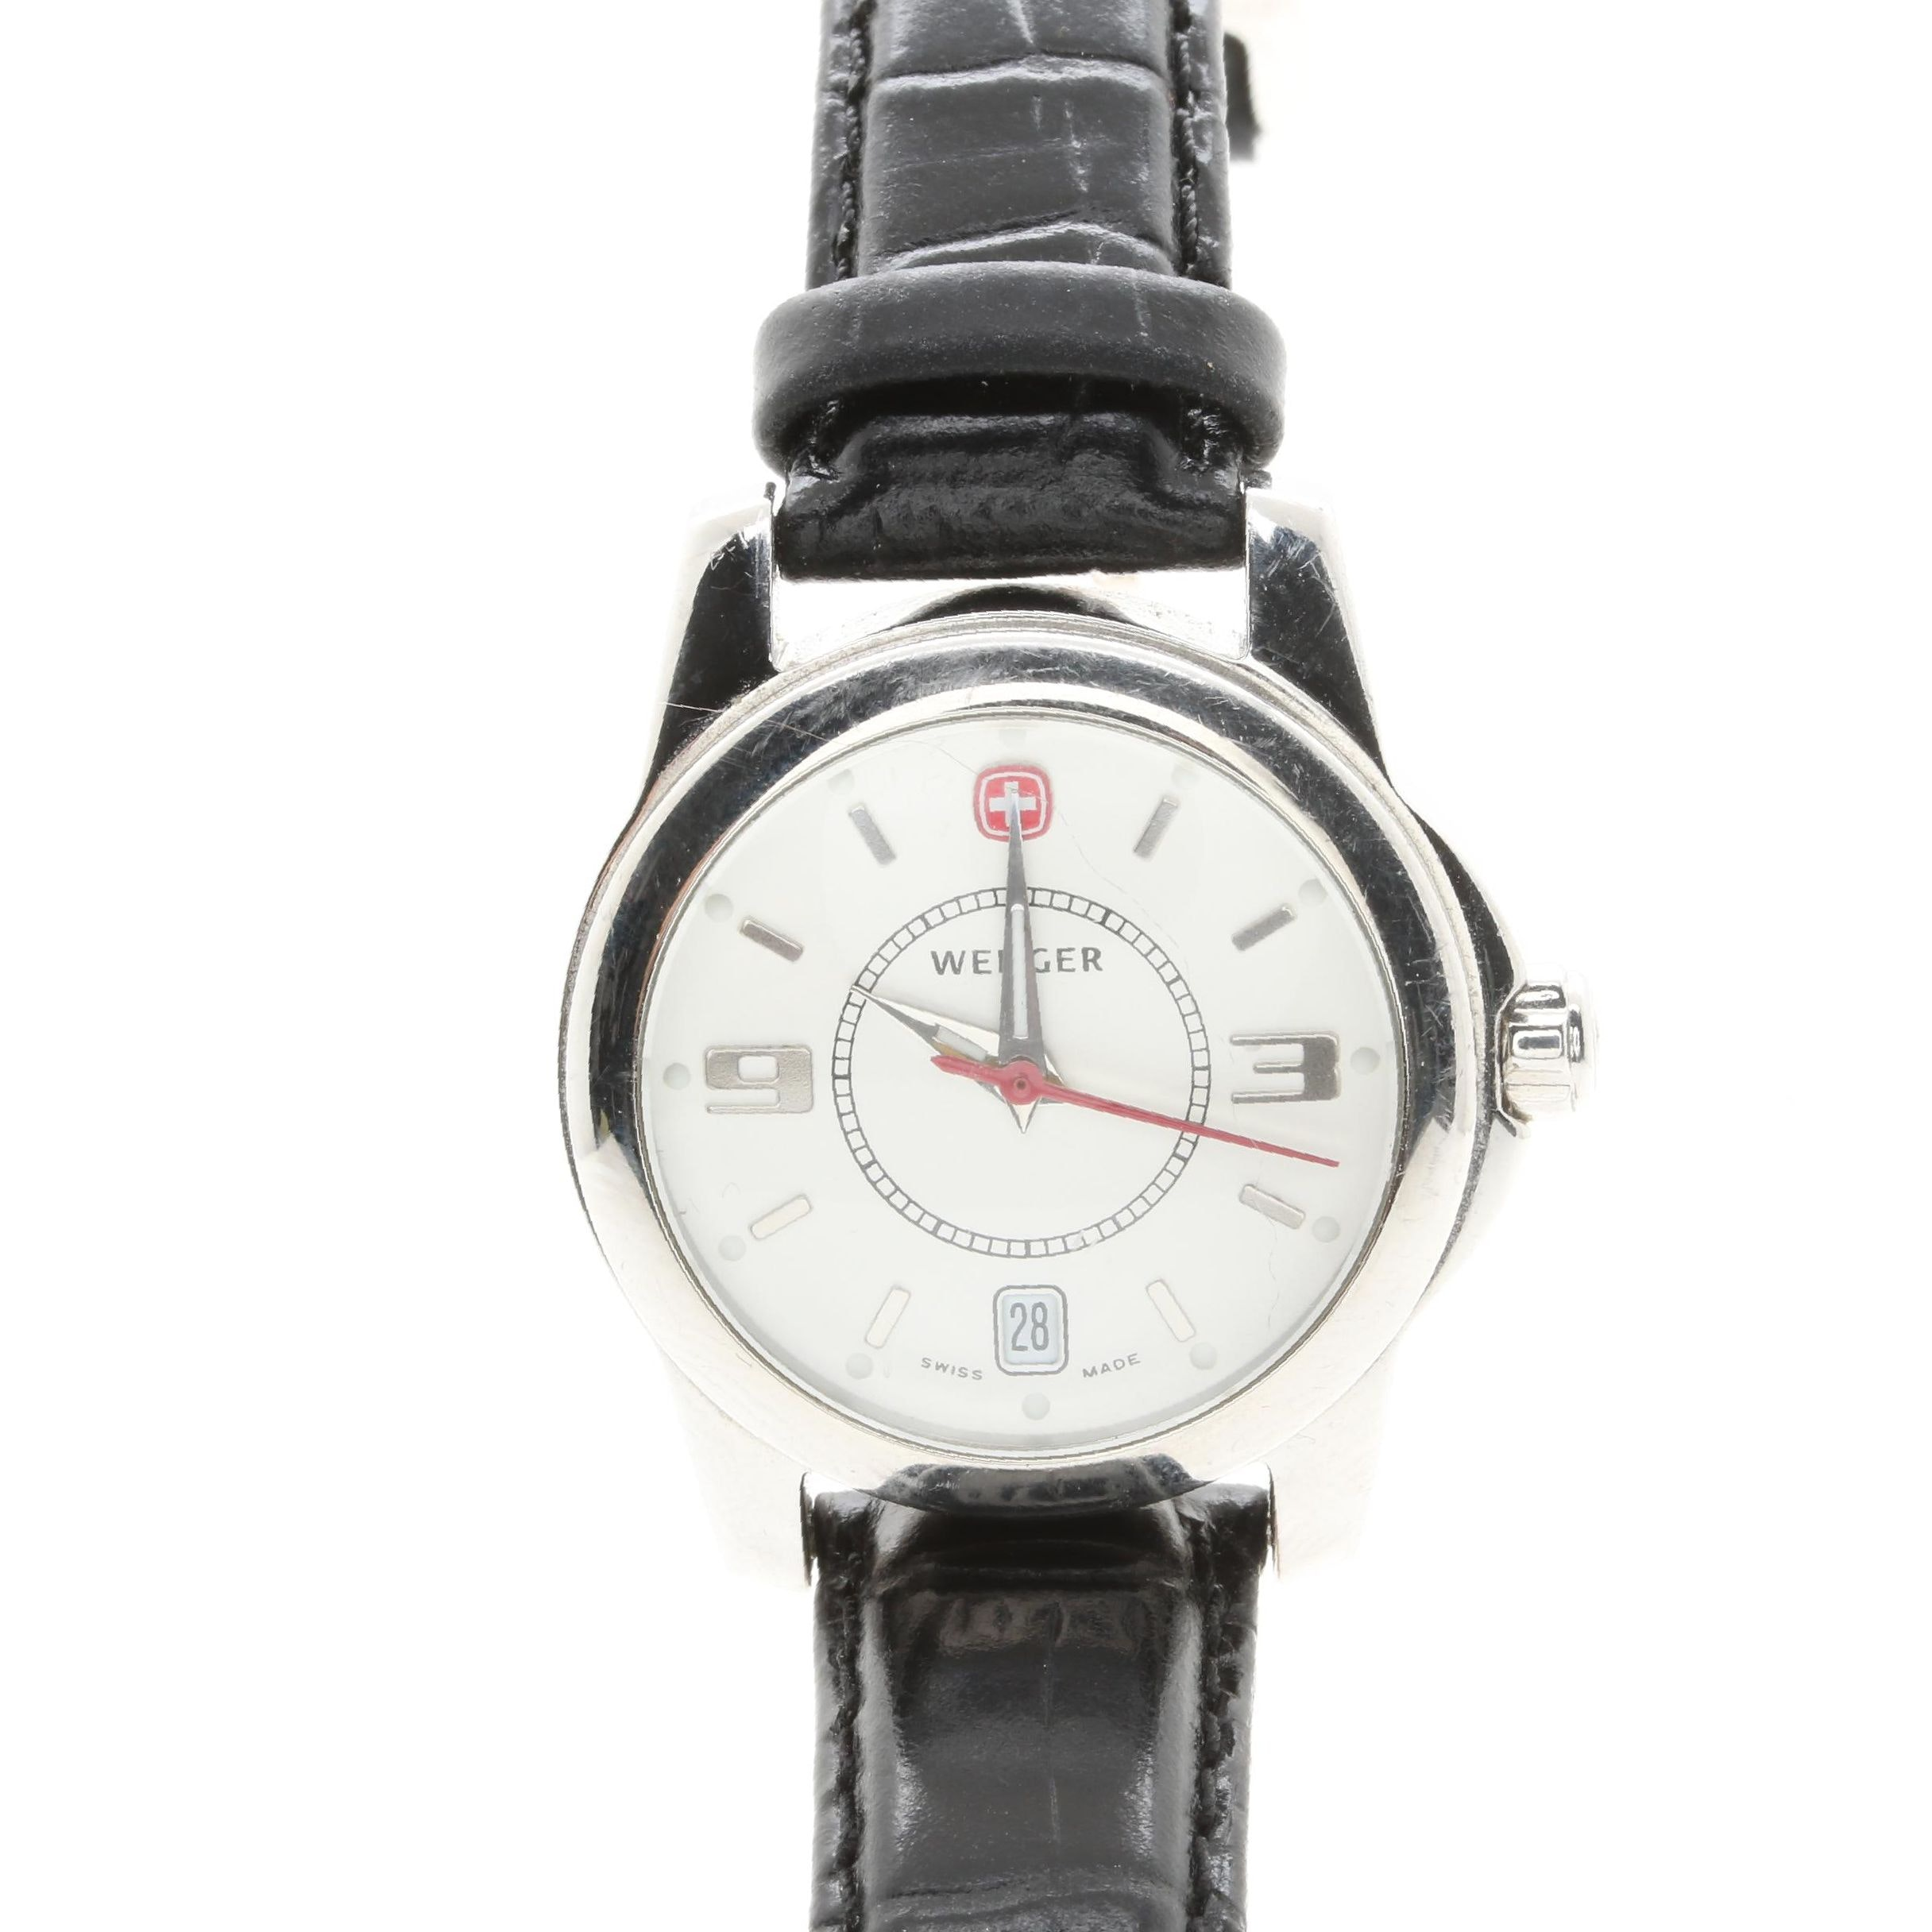 Wenger Silver Tone Wristwatch